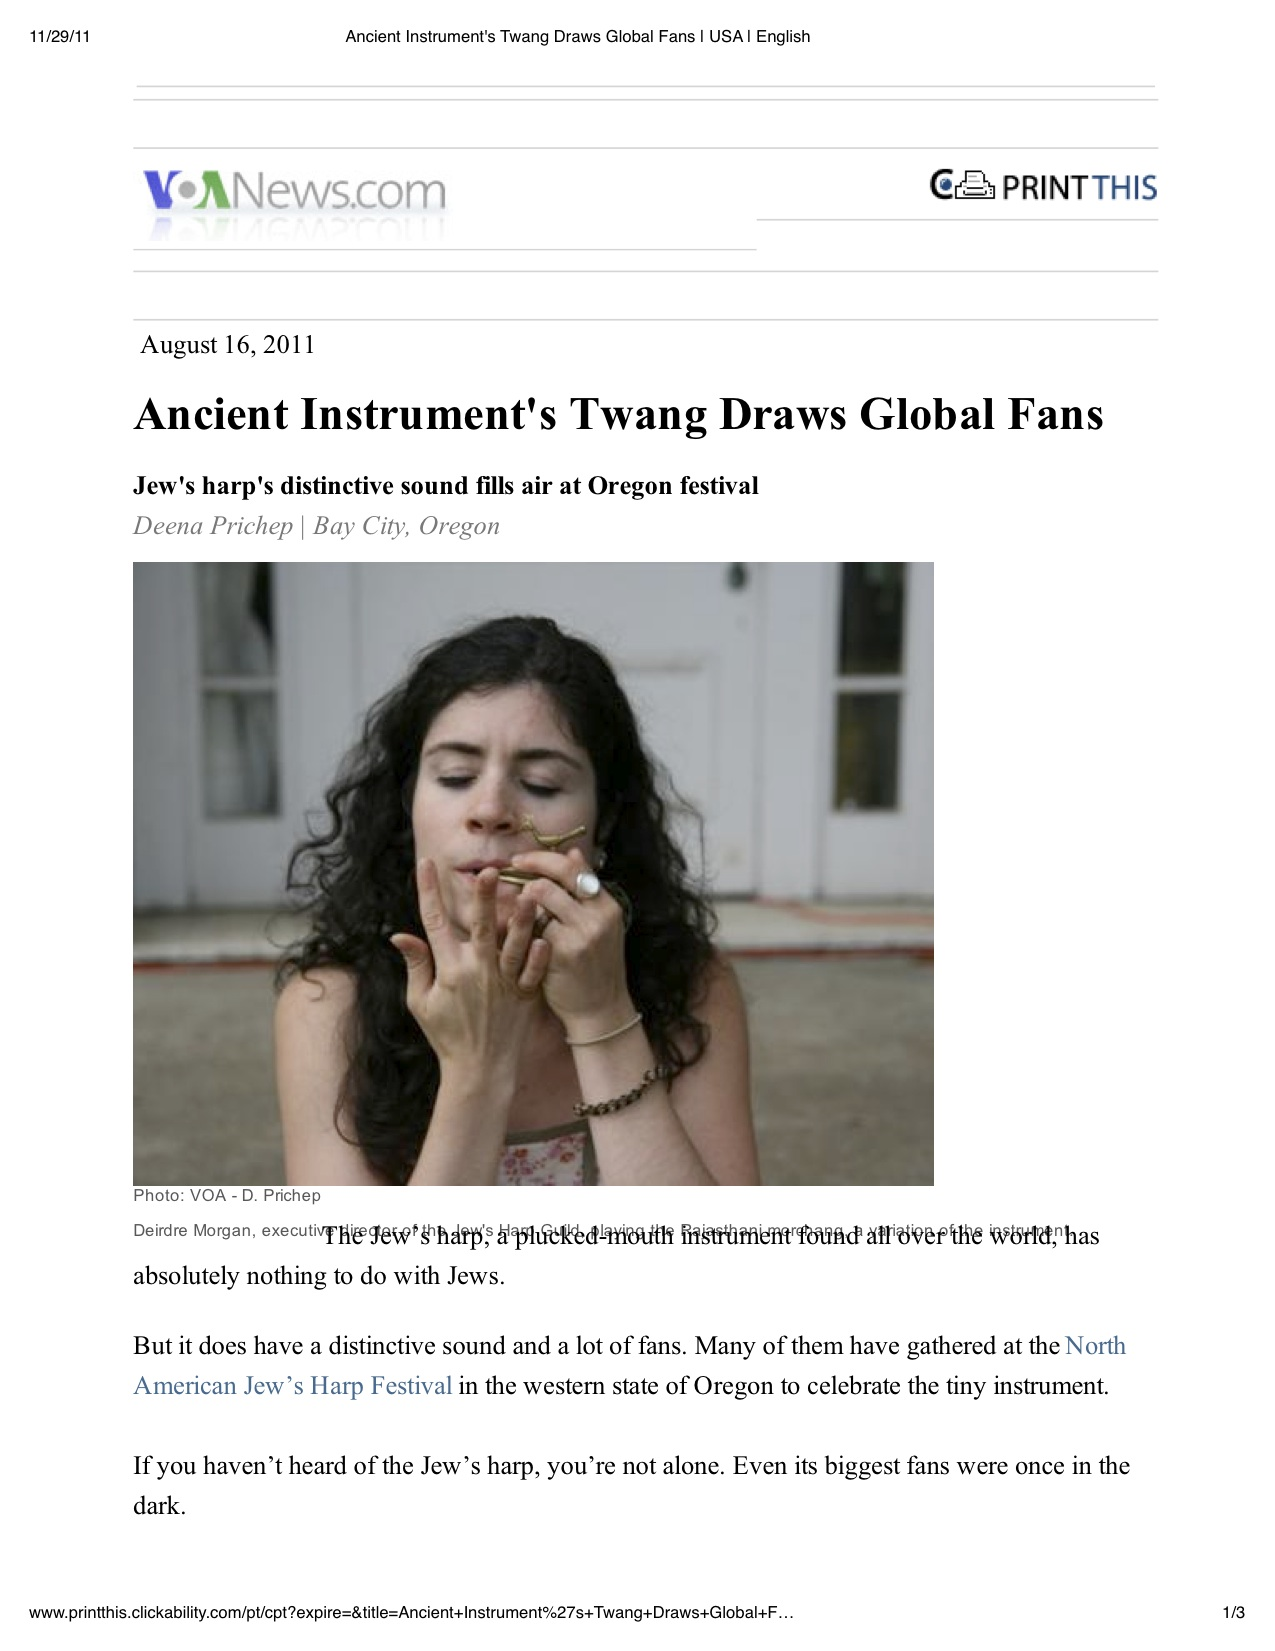 Ancient Instrument's Twang Draws Global Fans _ USA _ English.jpg